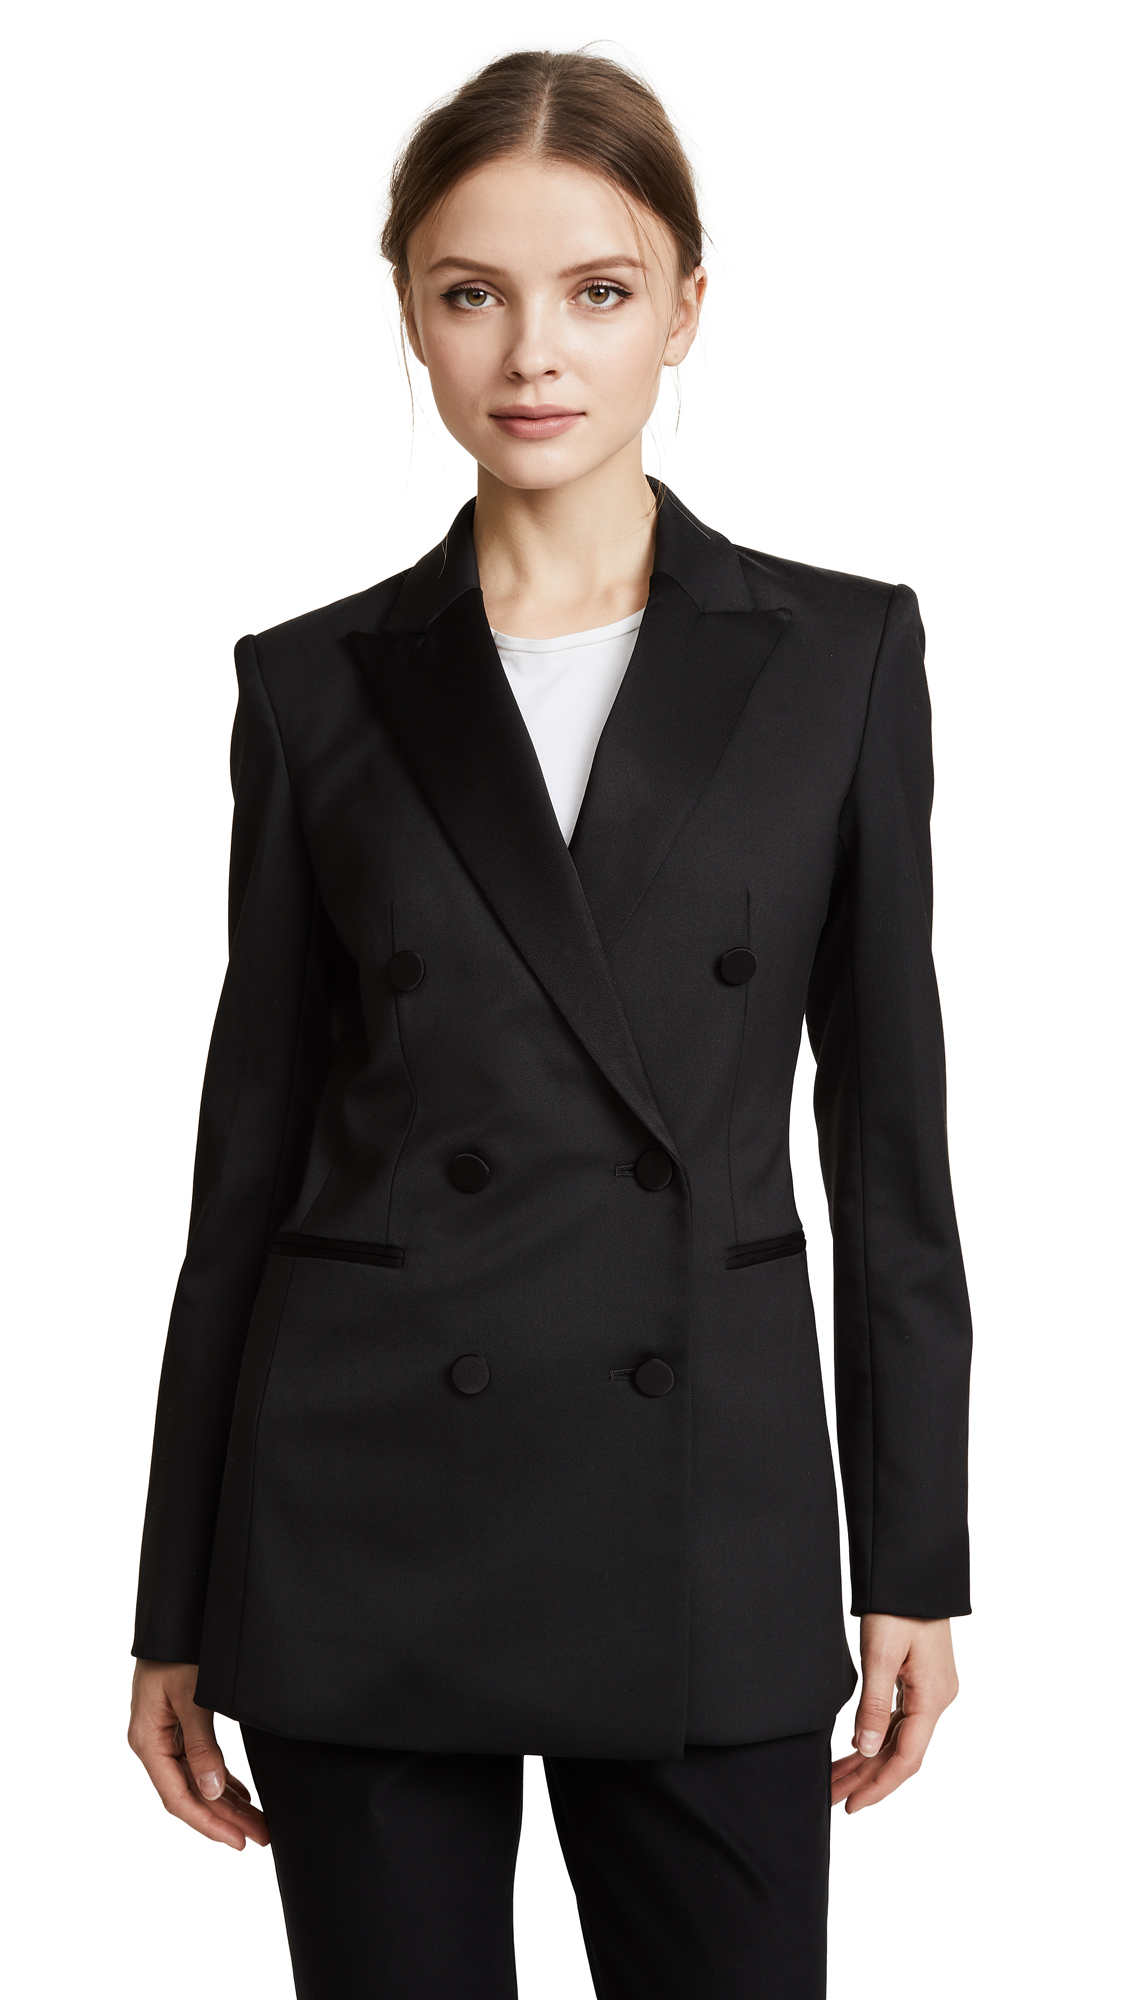 Theory Wool Tux Jacket - Black